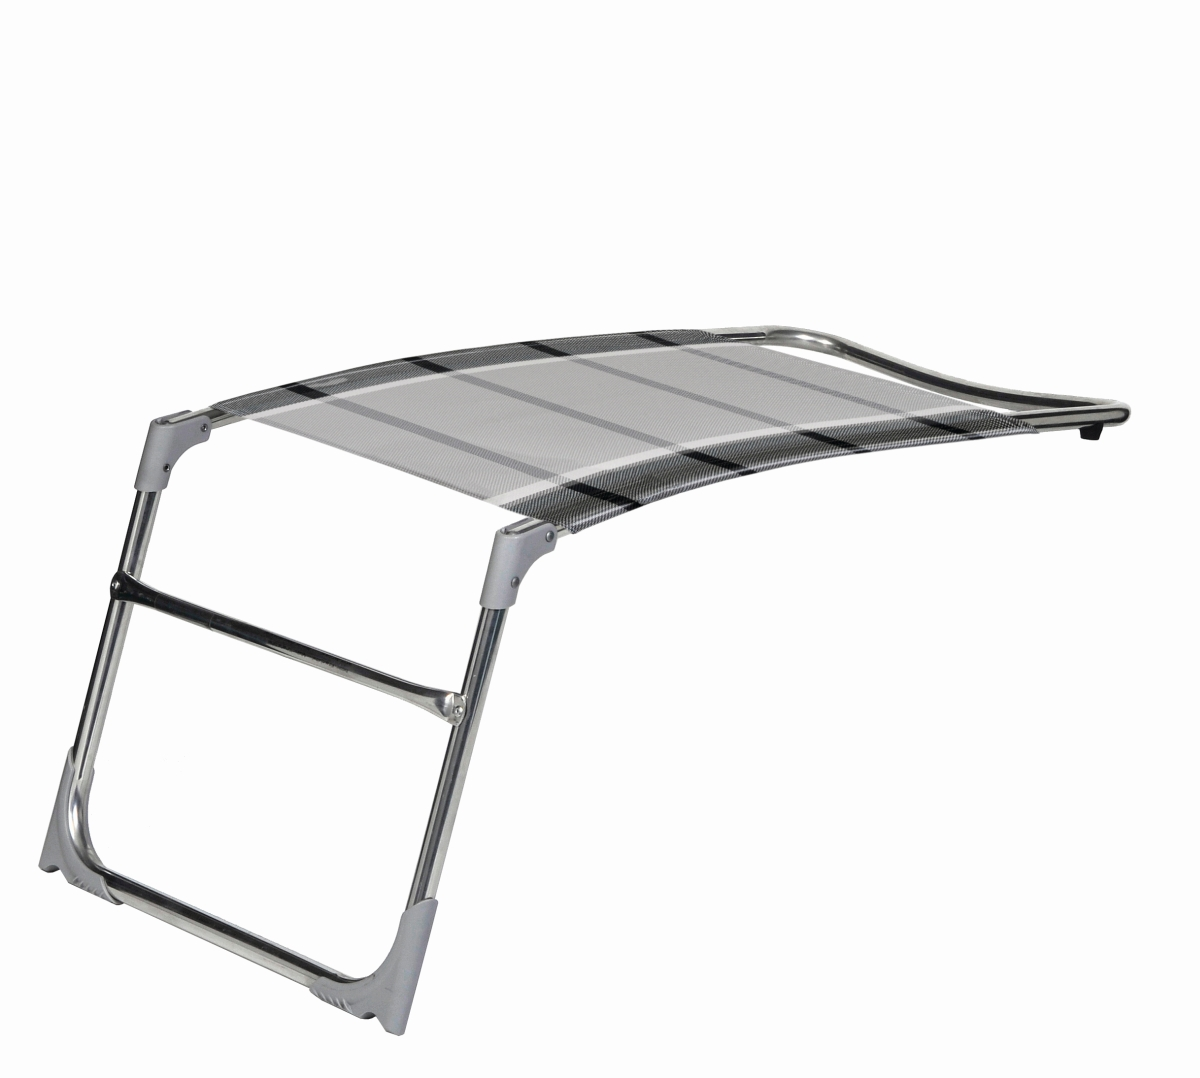 Dukdalf Fußteil SAMPLER grau/weiß 0649